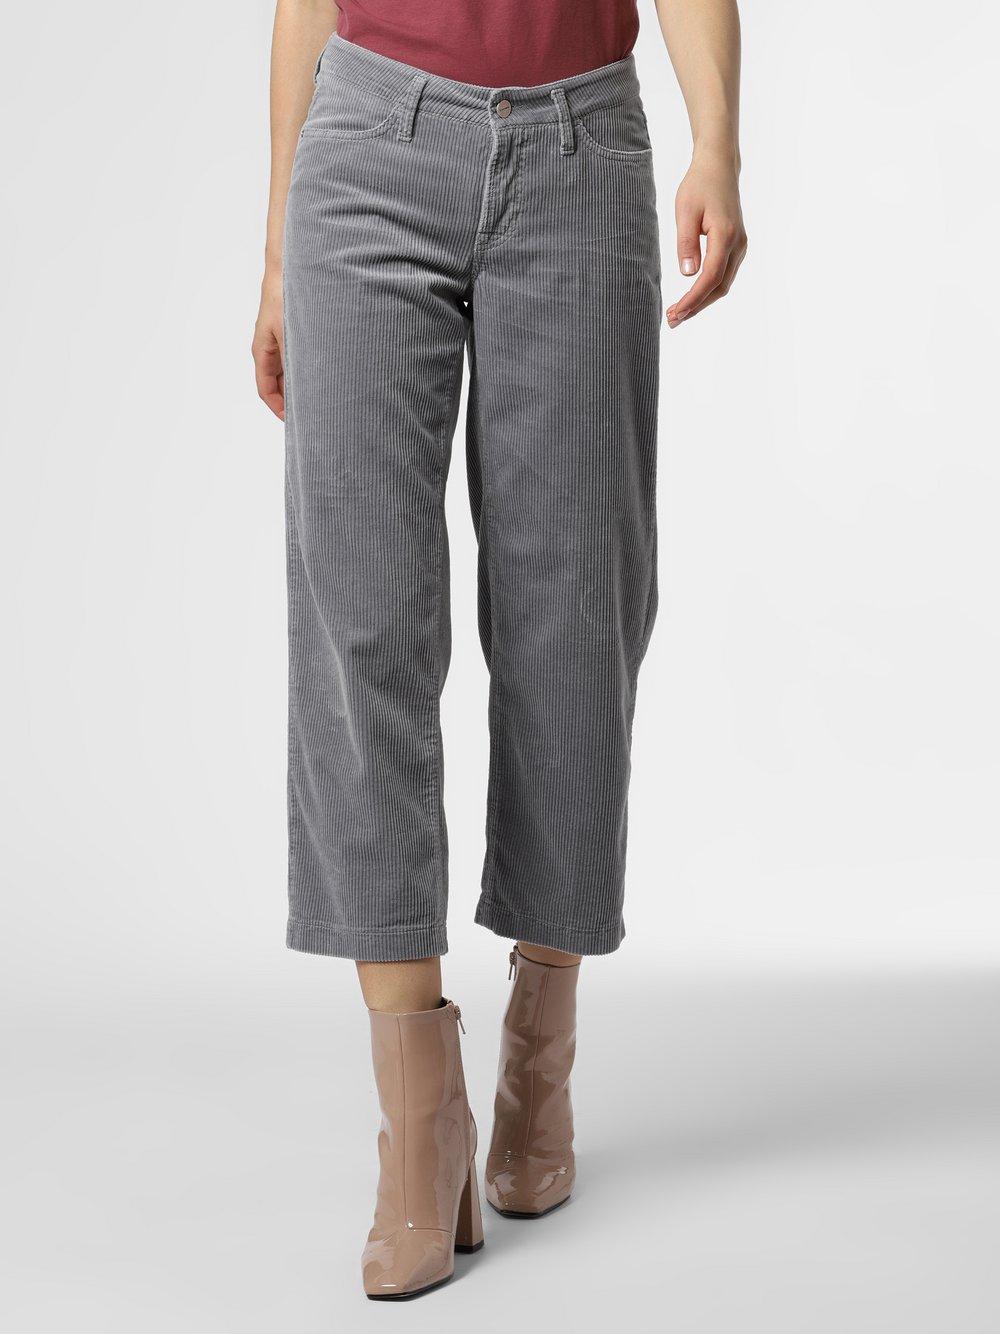 Cambio - Spodnie damskie – Phillipa, szary